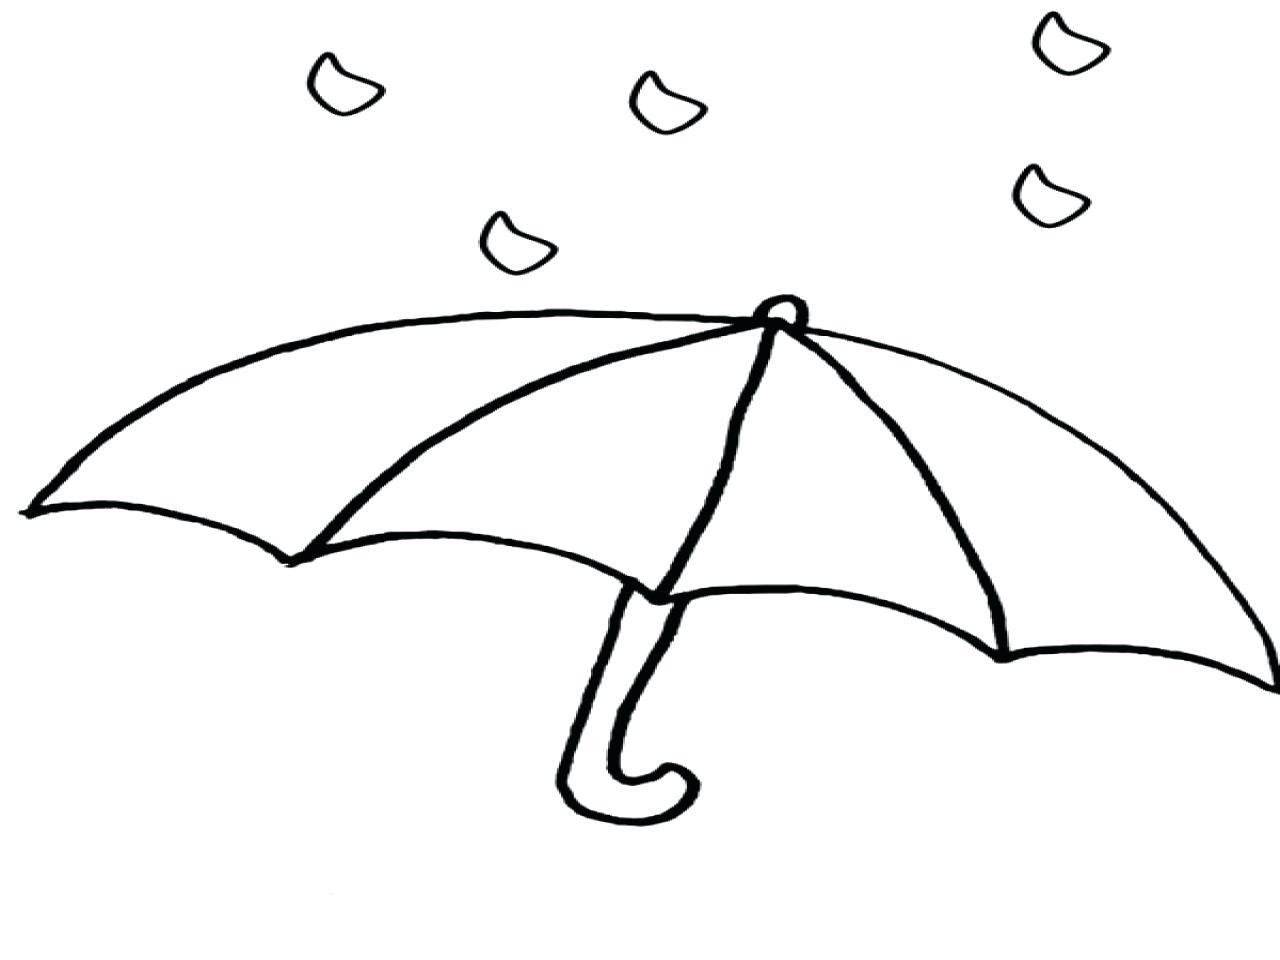 Raindrop Drawing at GetDrawings.com | Free for personal use Raindrop ...